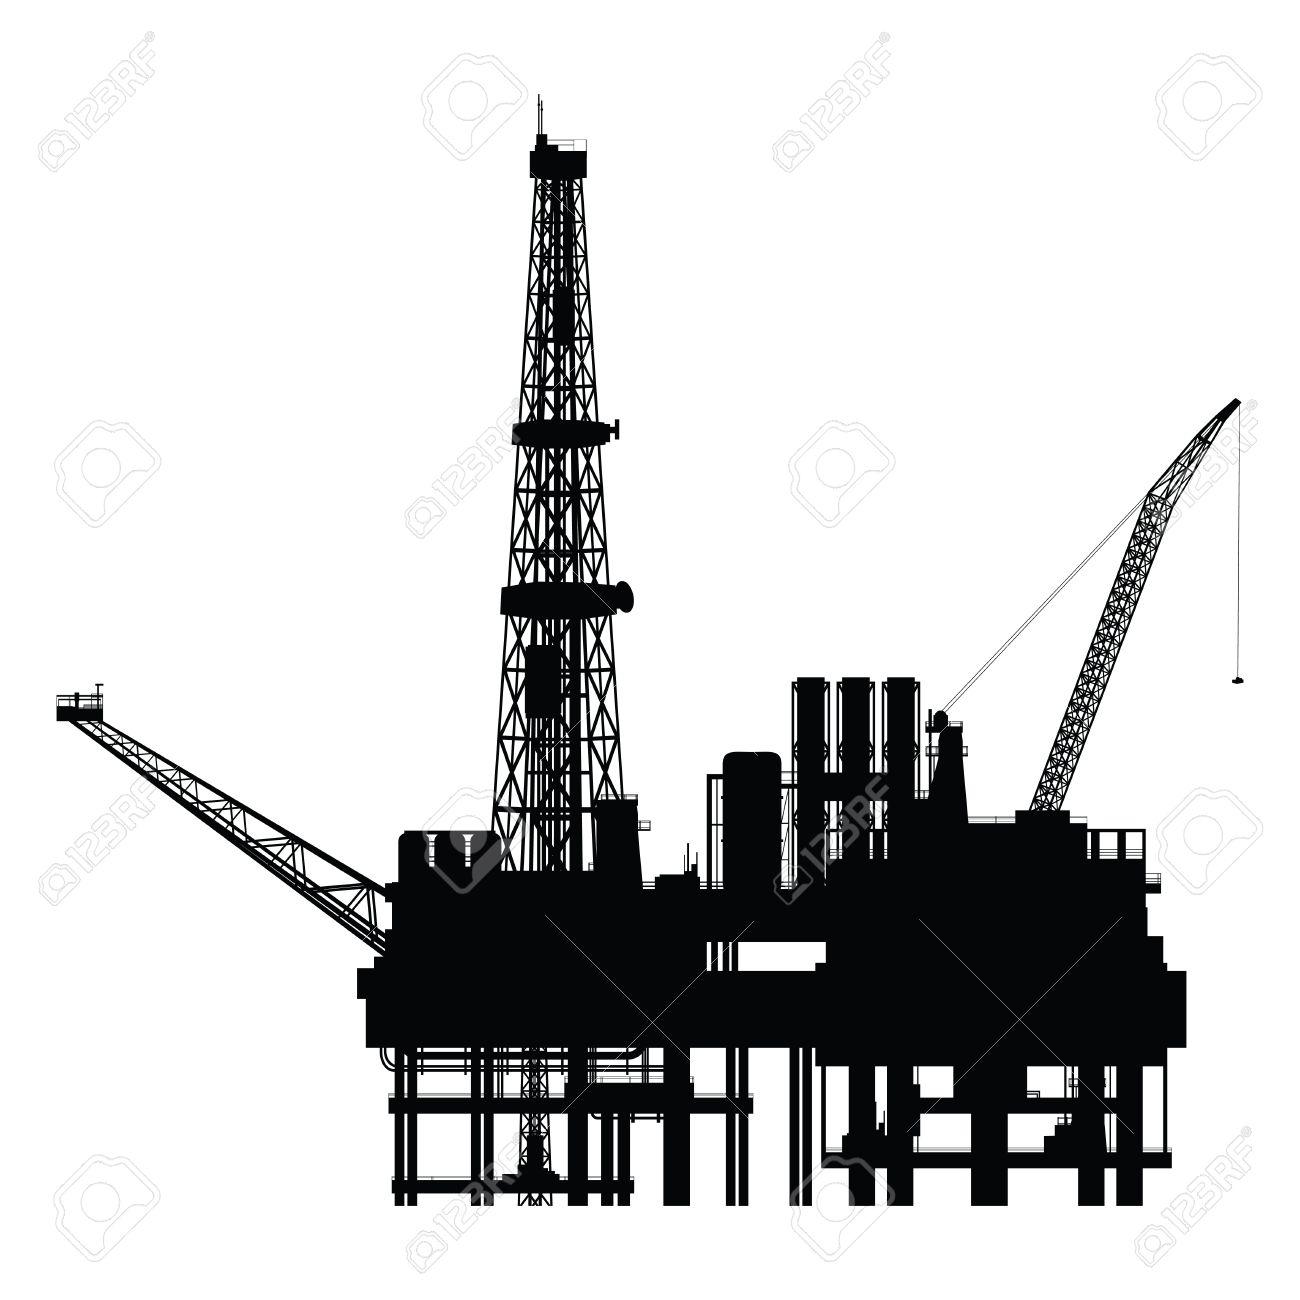 Silhouette of oil platform, vector illustration - 27894974